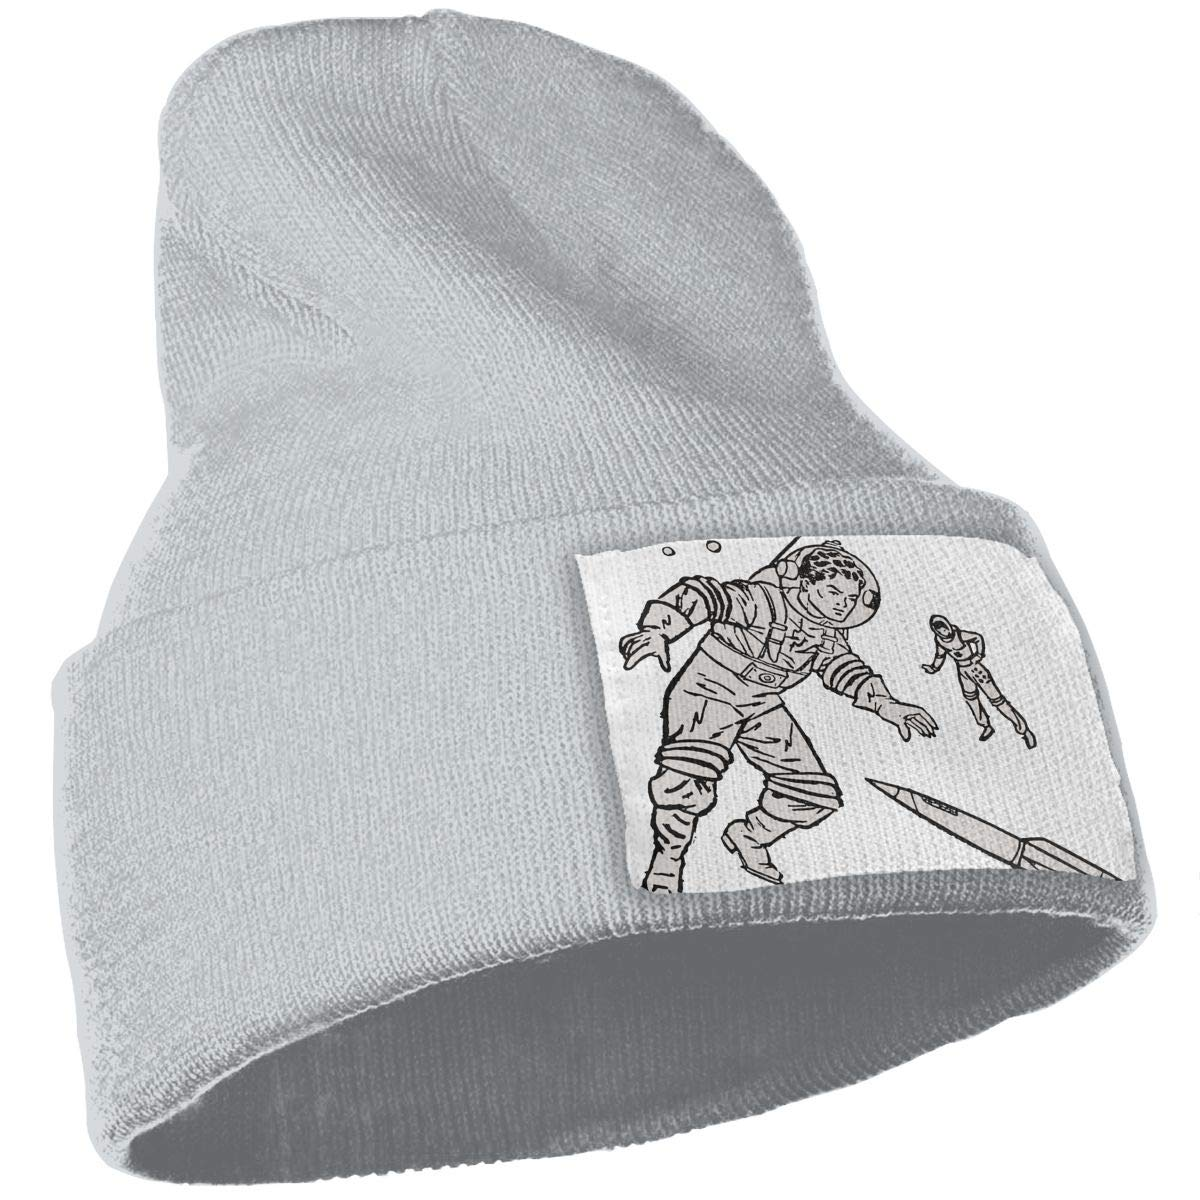 QZqDQ Space Astronaut Unisex Fashion Knitted Hat Luxury Hip-Hop Cap